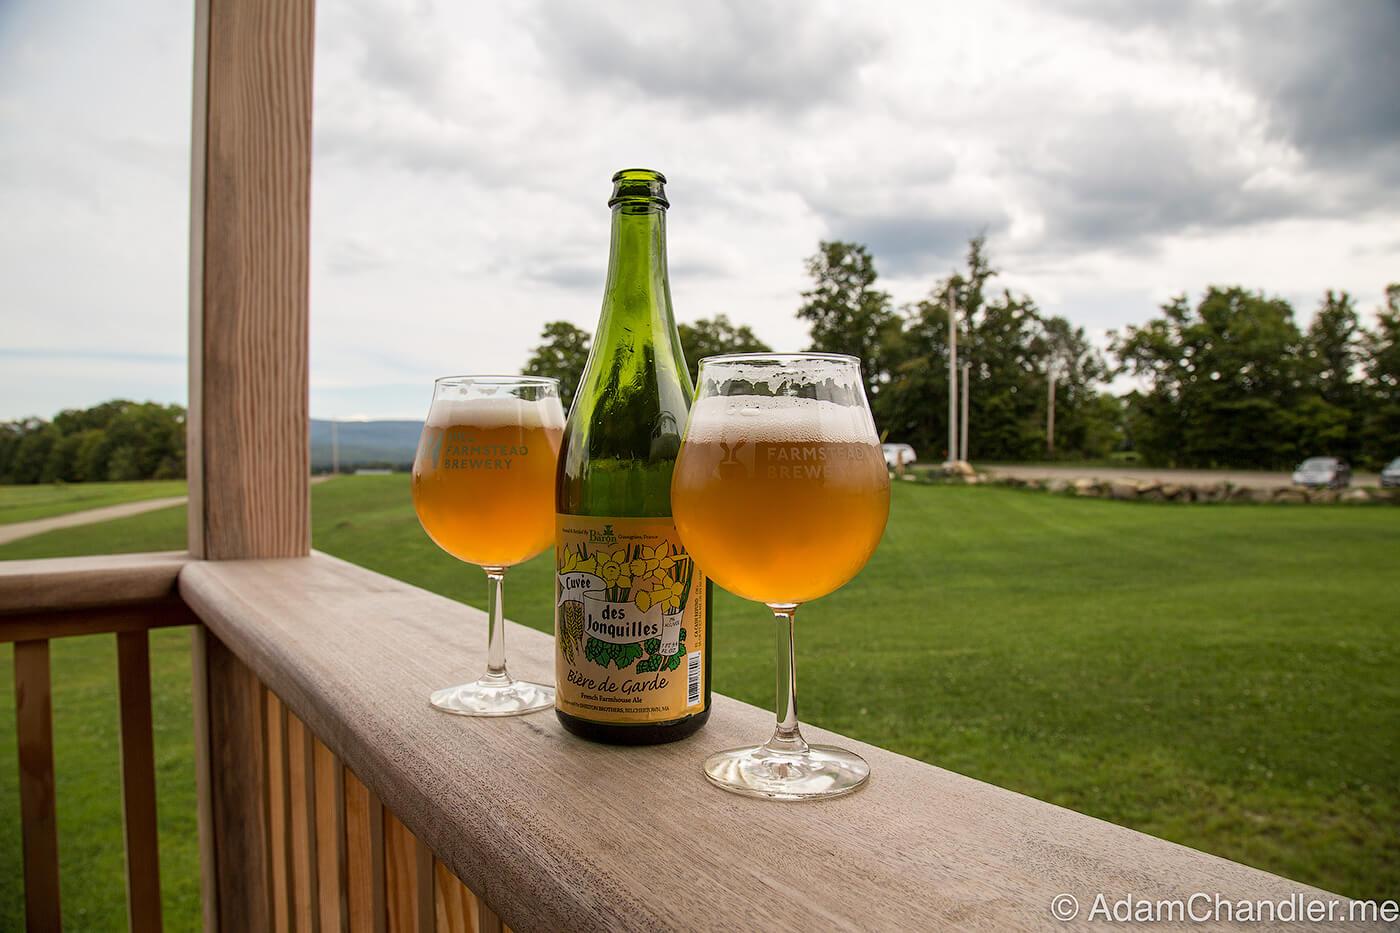 Hill Farmstead Bière de garde